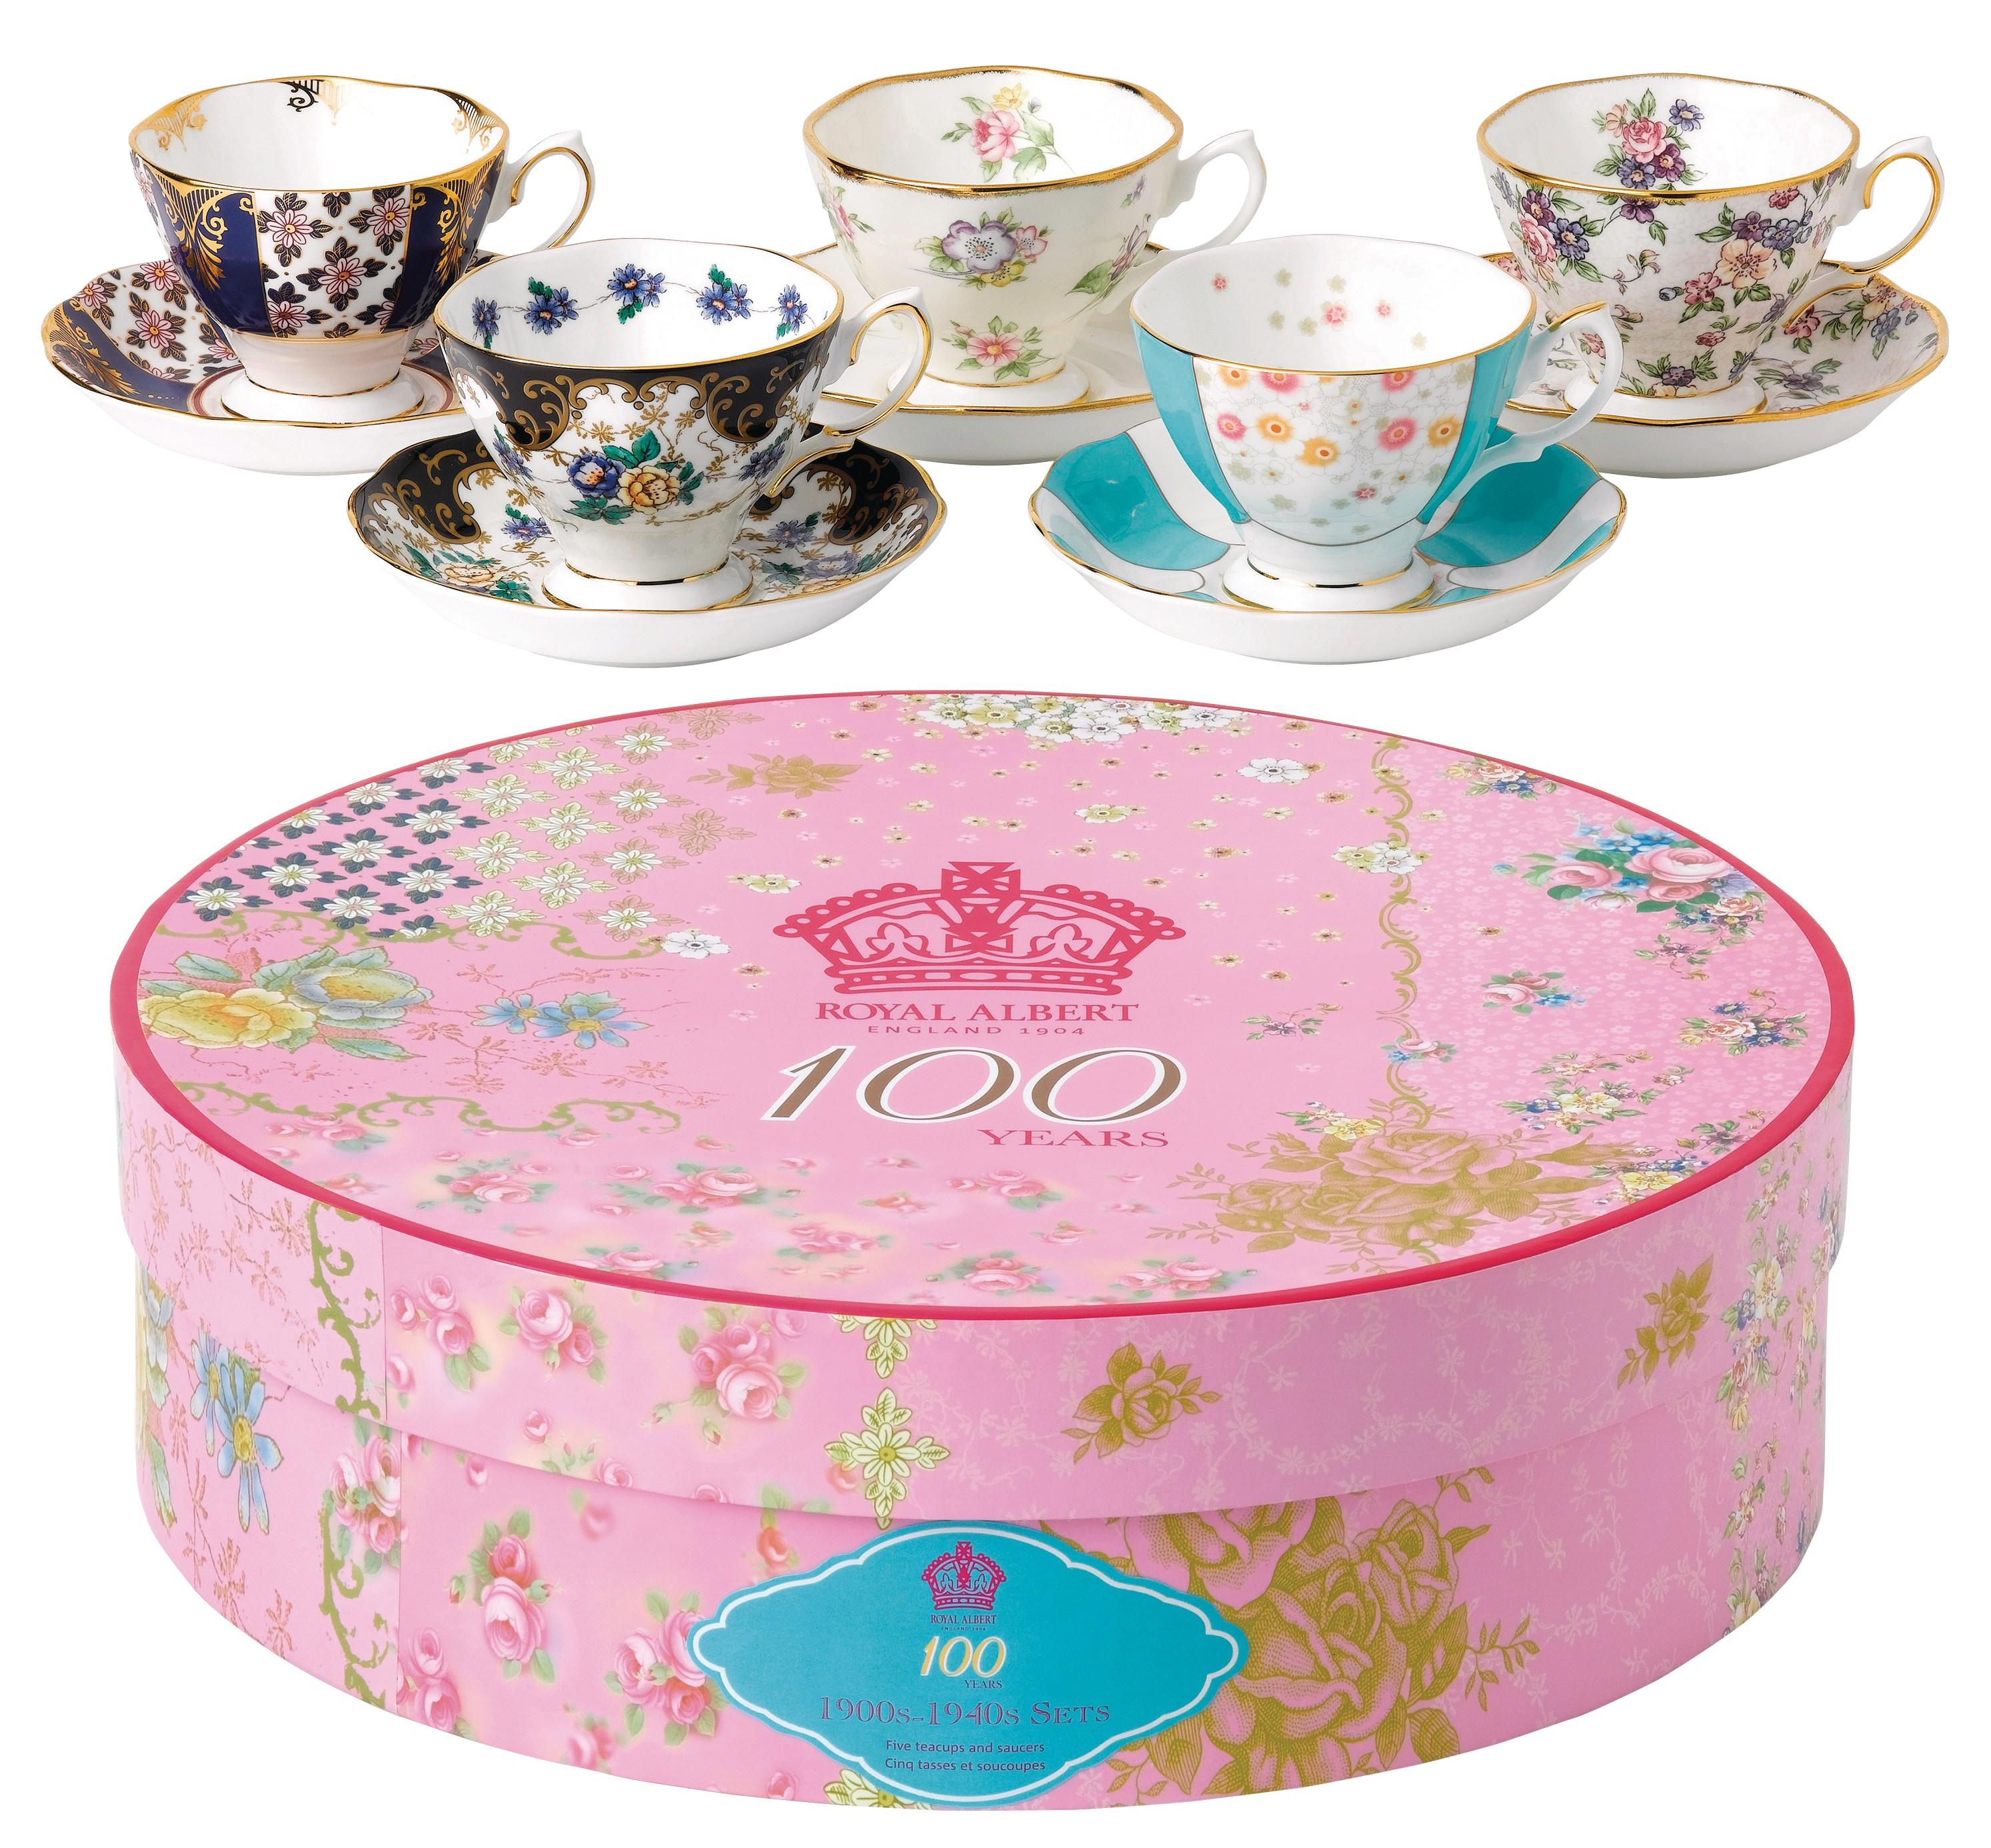 sc 1 st  DecoChic.fr & 5 Set Teacup u0026 Saucer 100 Years Collection Royal Albert 1900-1940